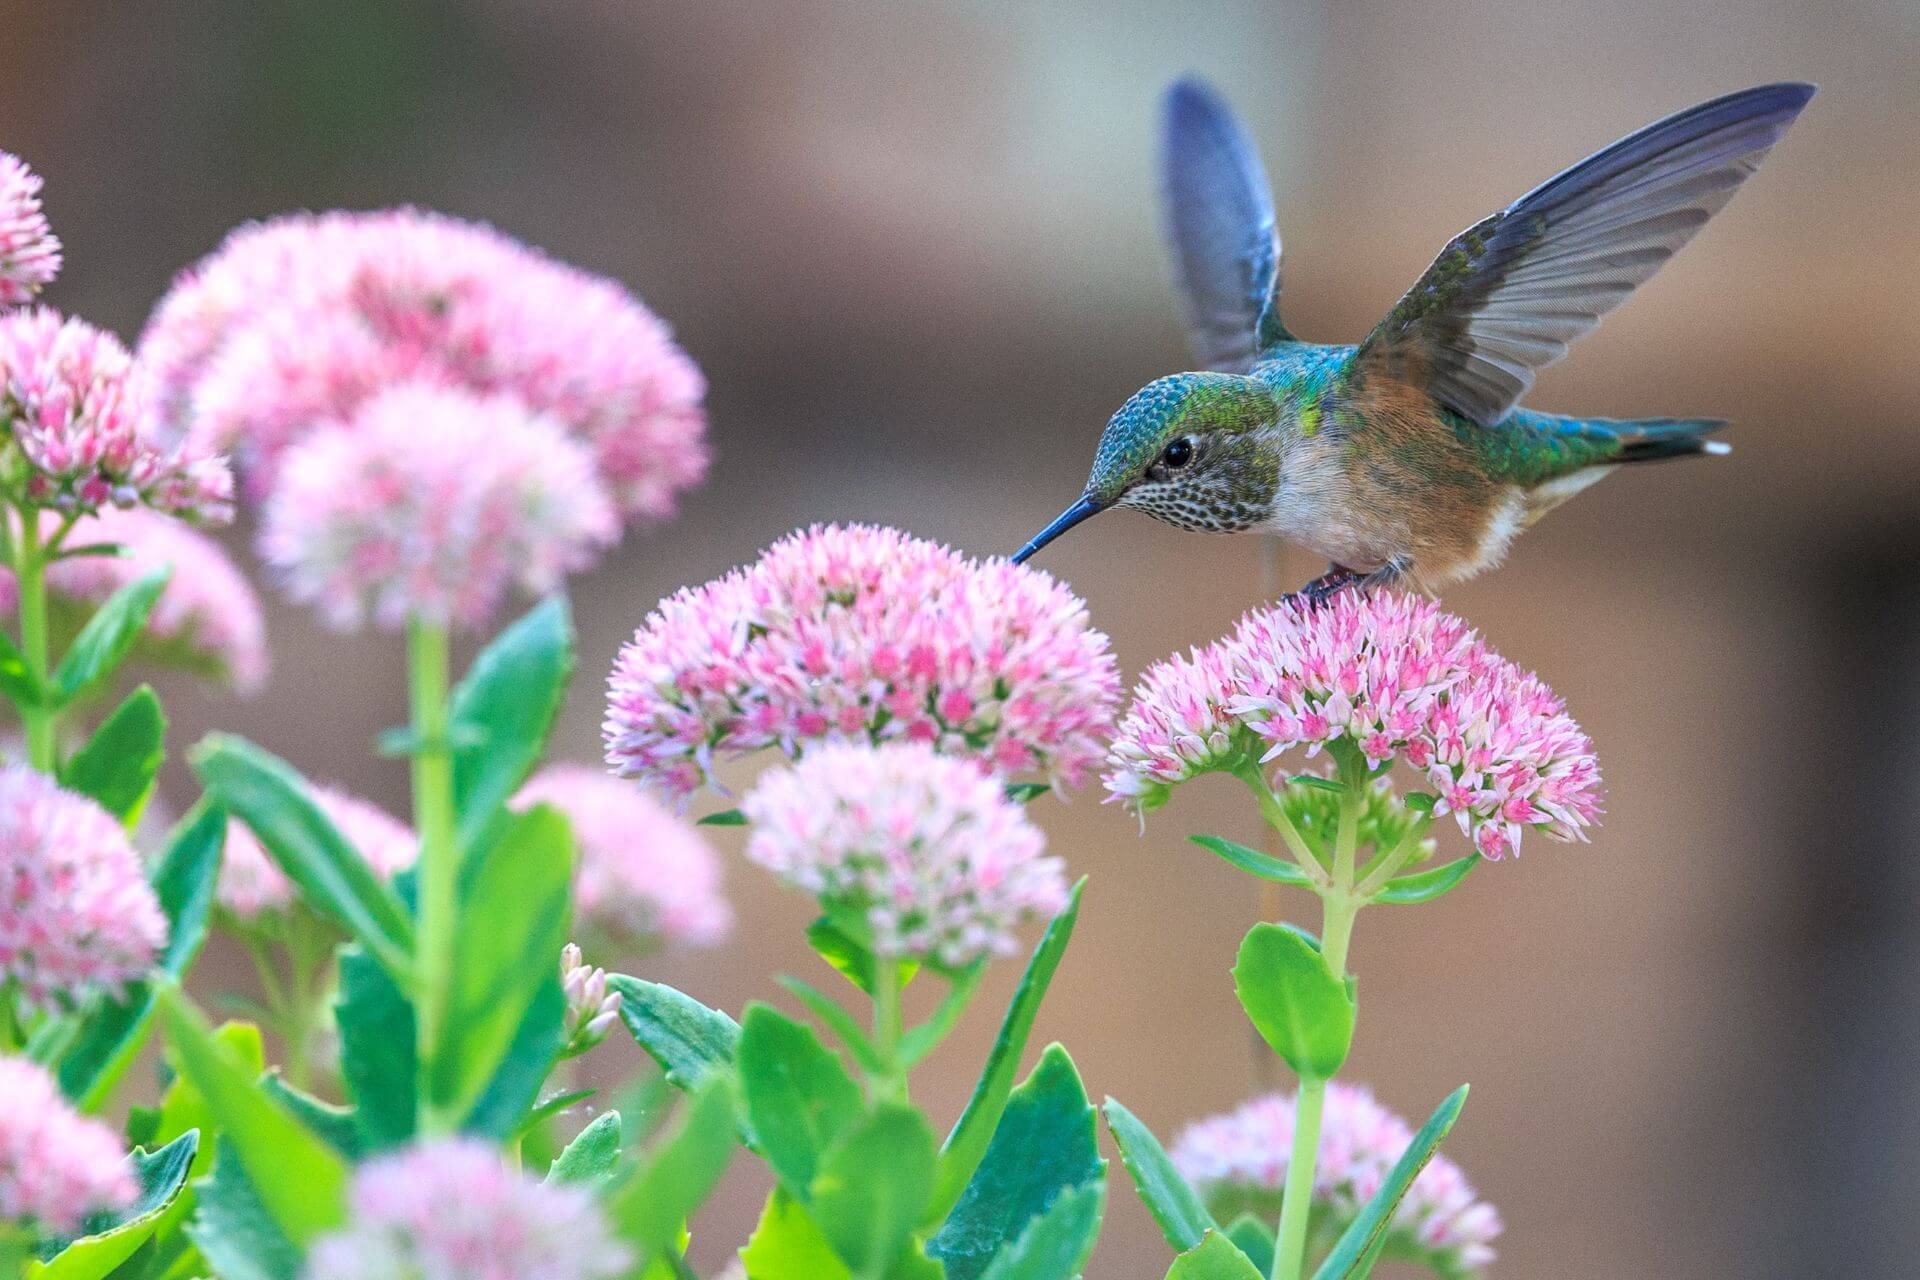 A hummingbird to represent the Balfour Wilson Recruitment logo